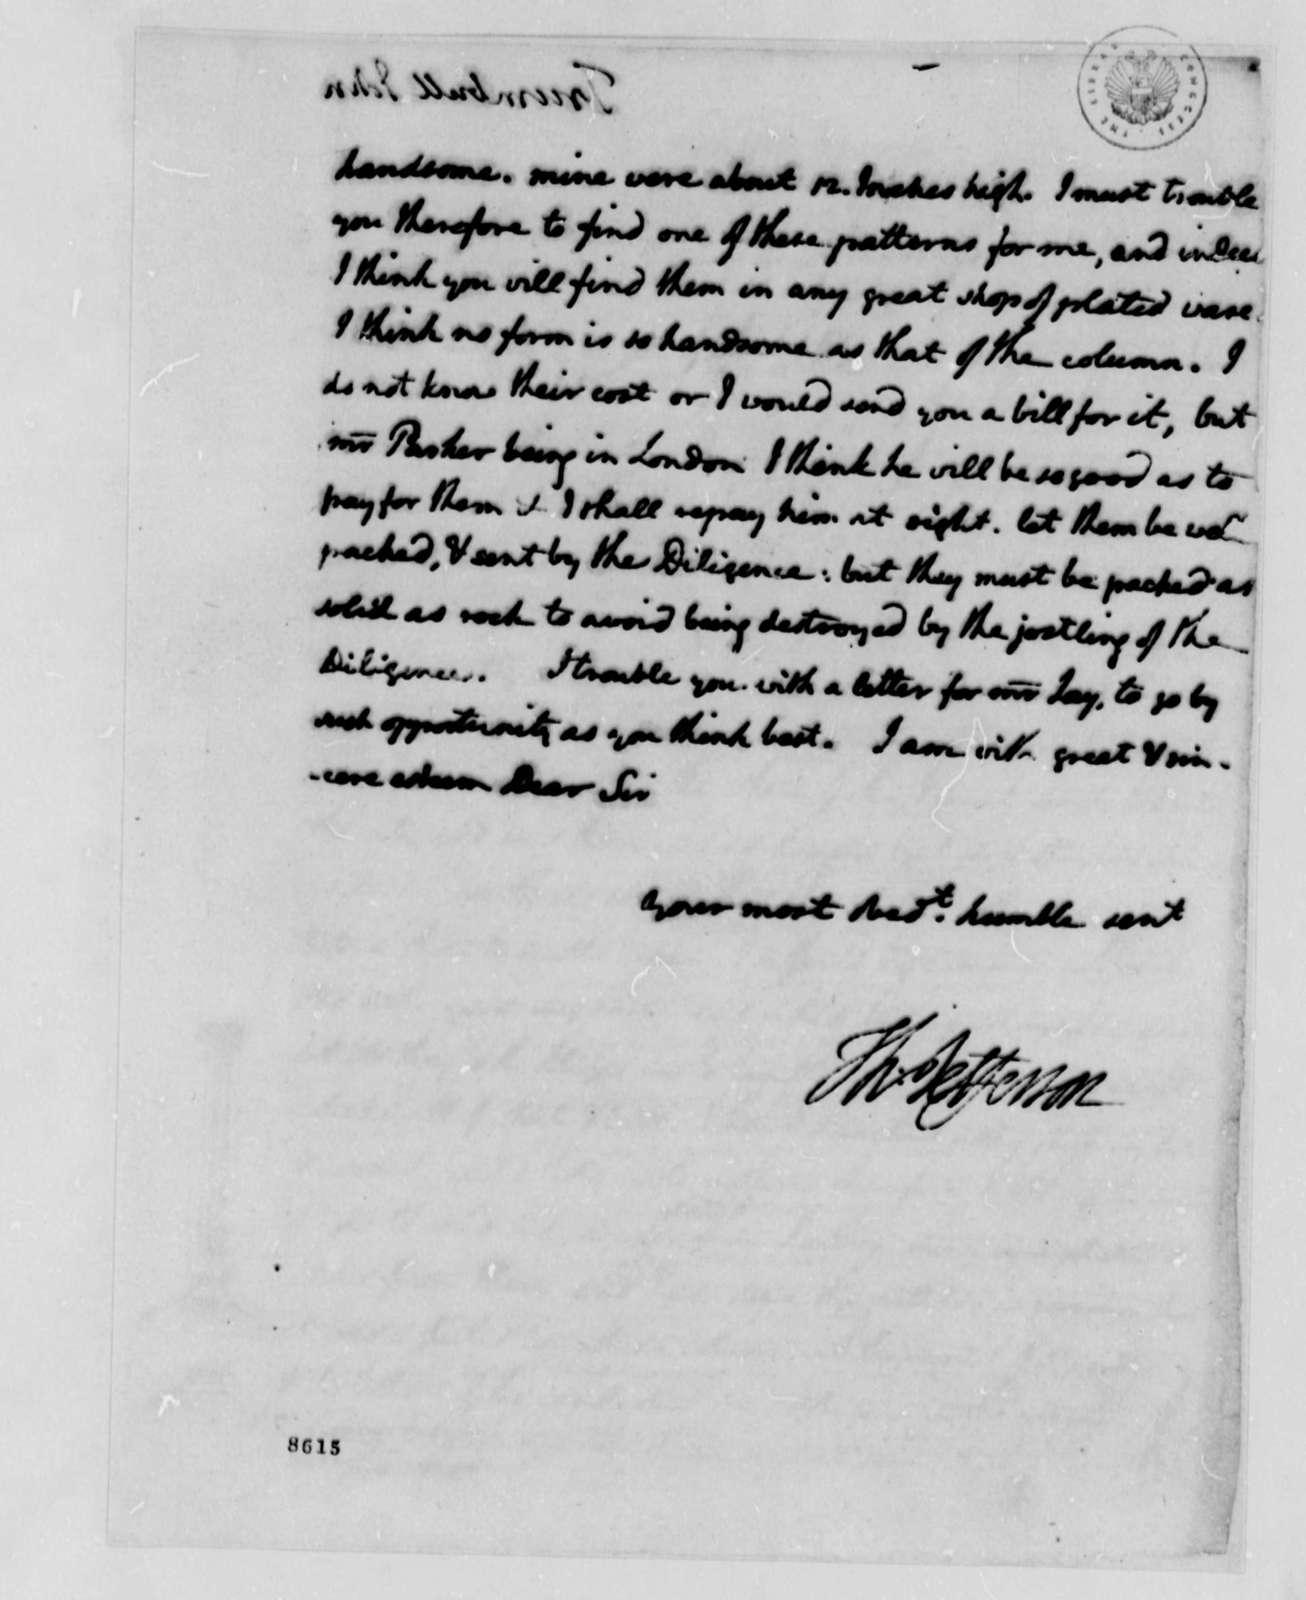 Thomas Jefferson to John Trumbull, August 5, 1789